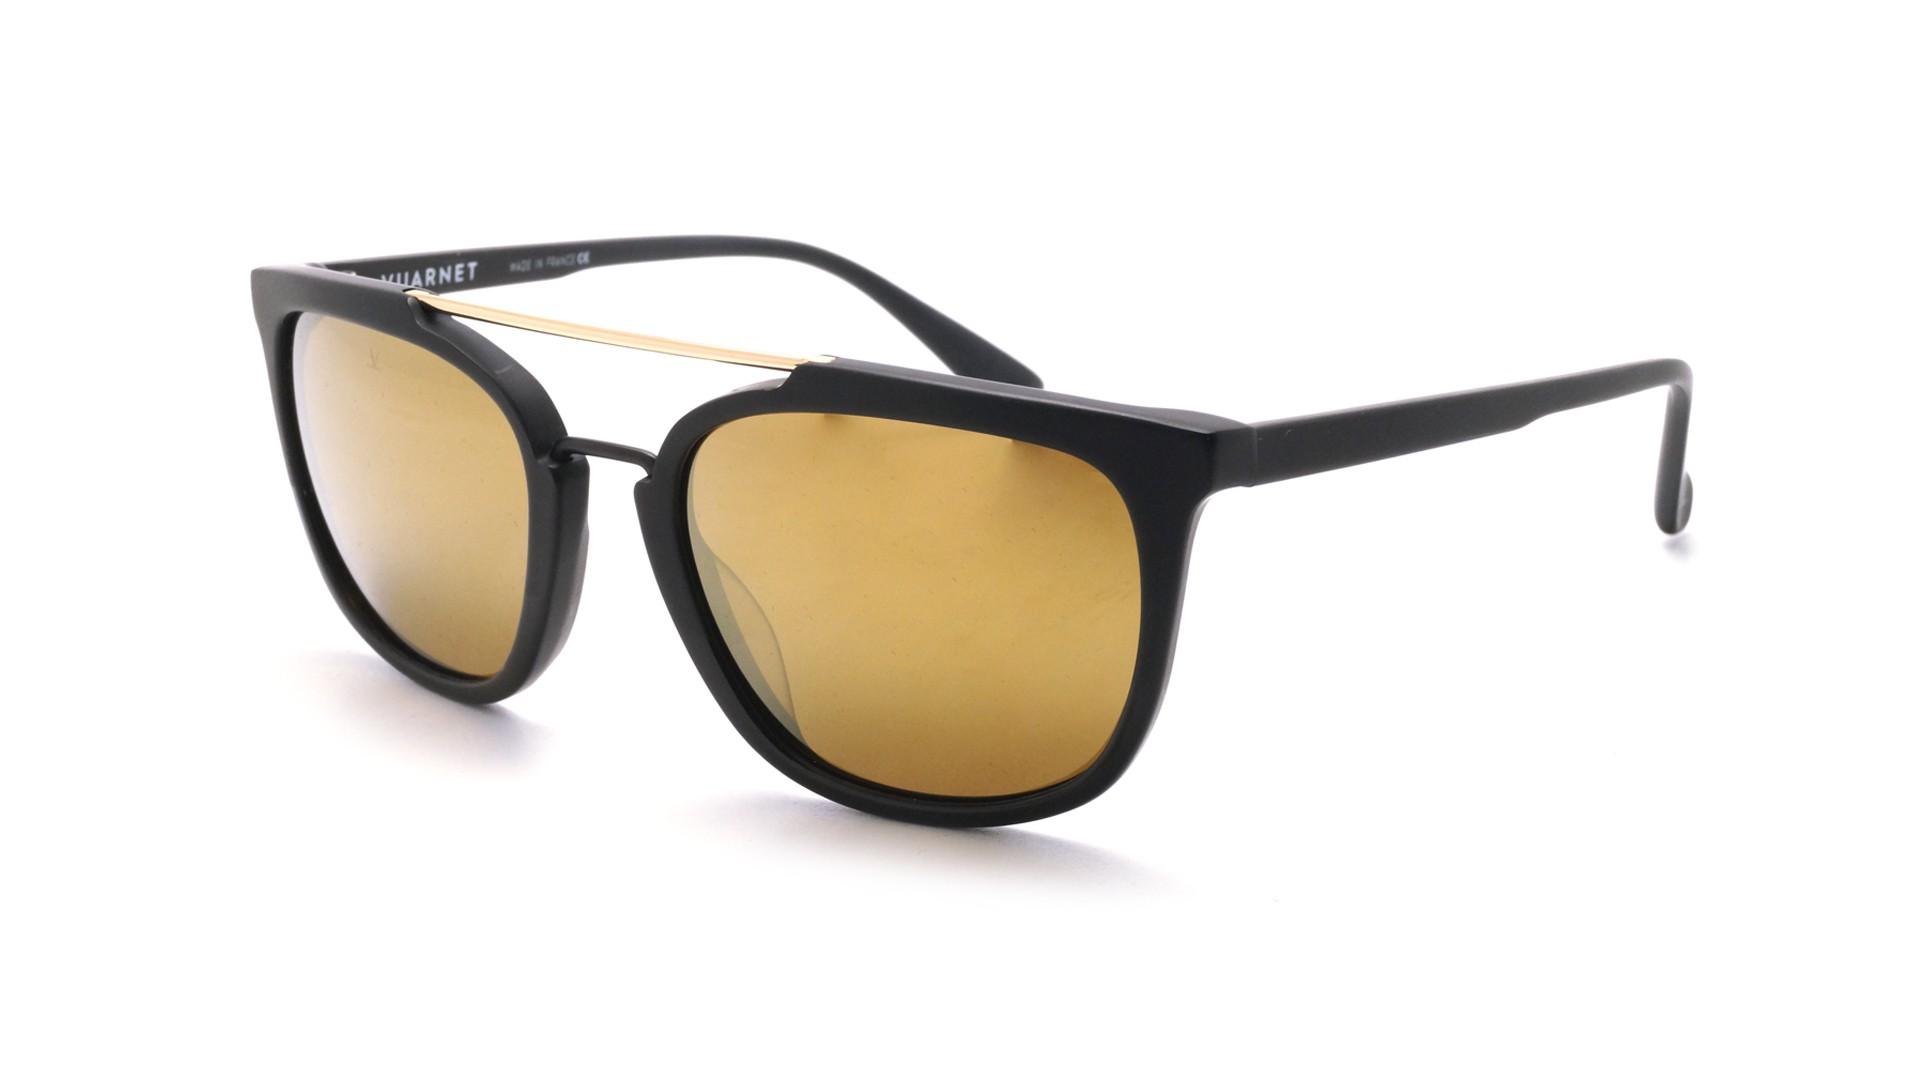 223f0209c72b Sunglasses Vuarnet Cable Car Square Black Matte VL1604 0001 53-18 Medium  Mirror